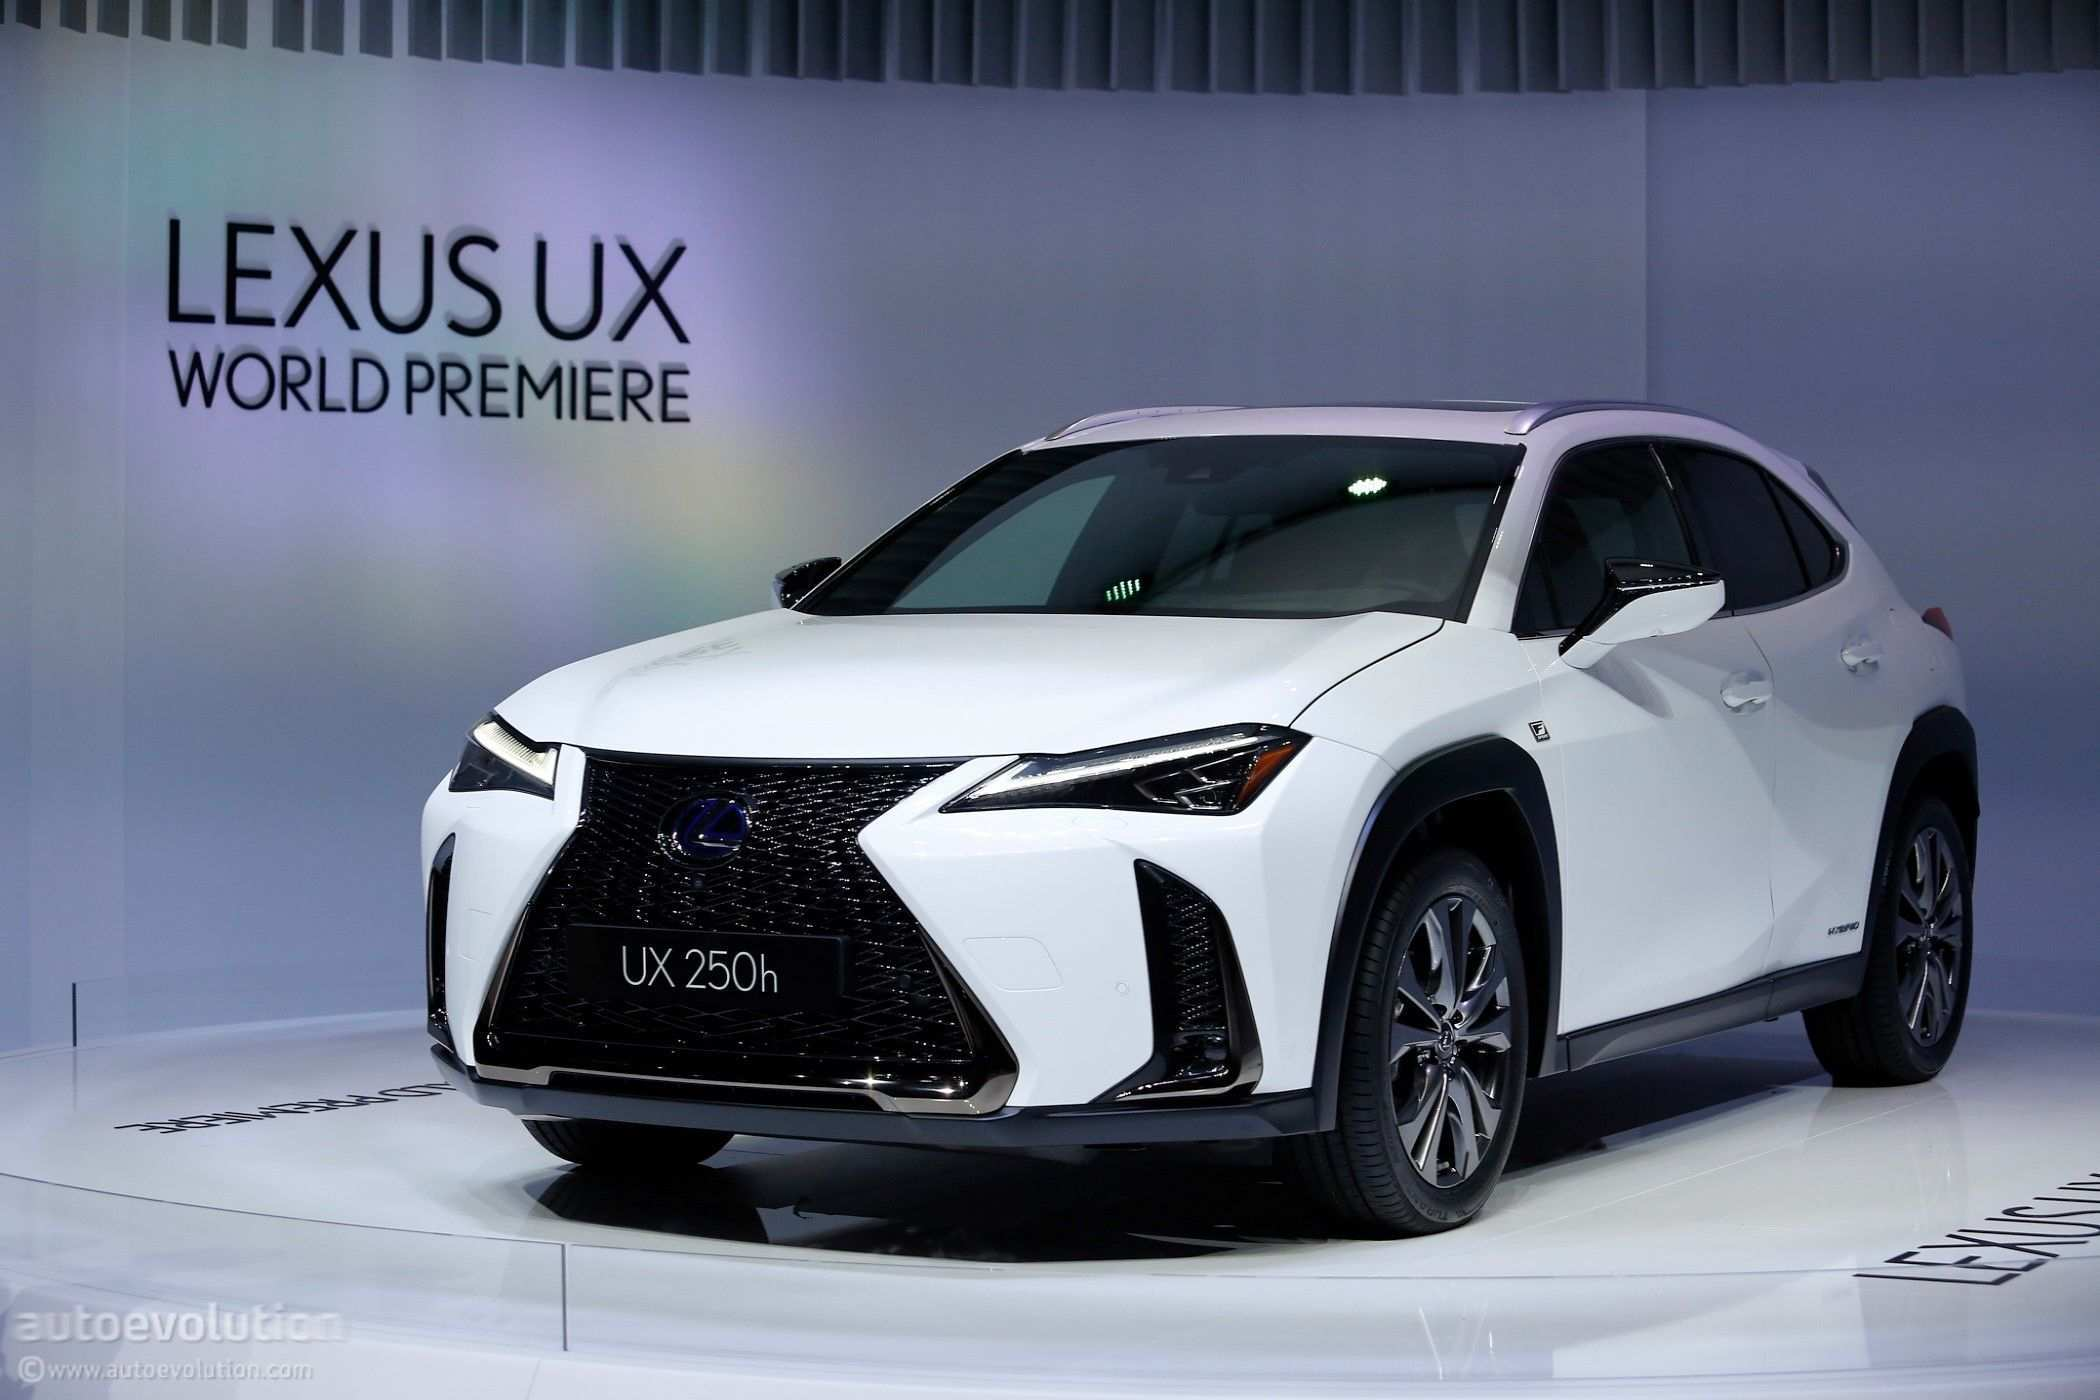 43 New Lexus Ux 2020 New Concept Performance for Lexus Ux 2020 New Concept